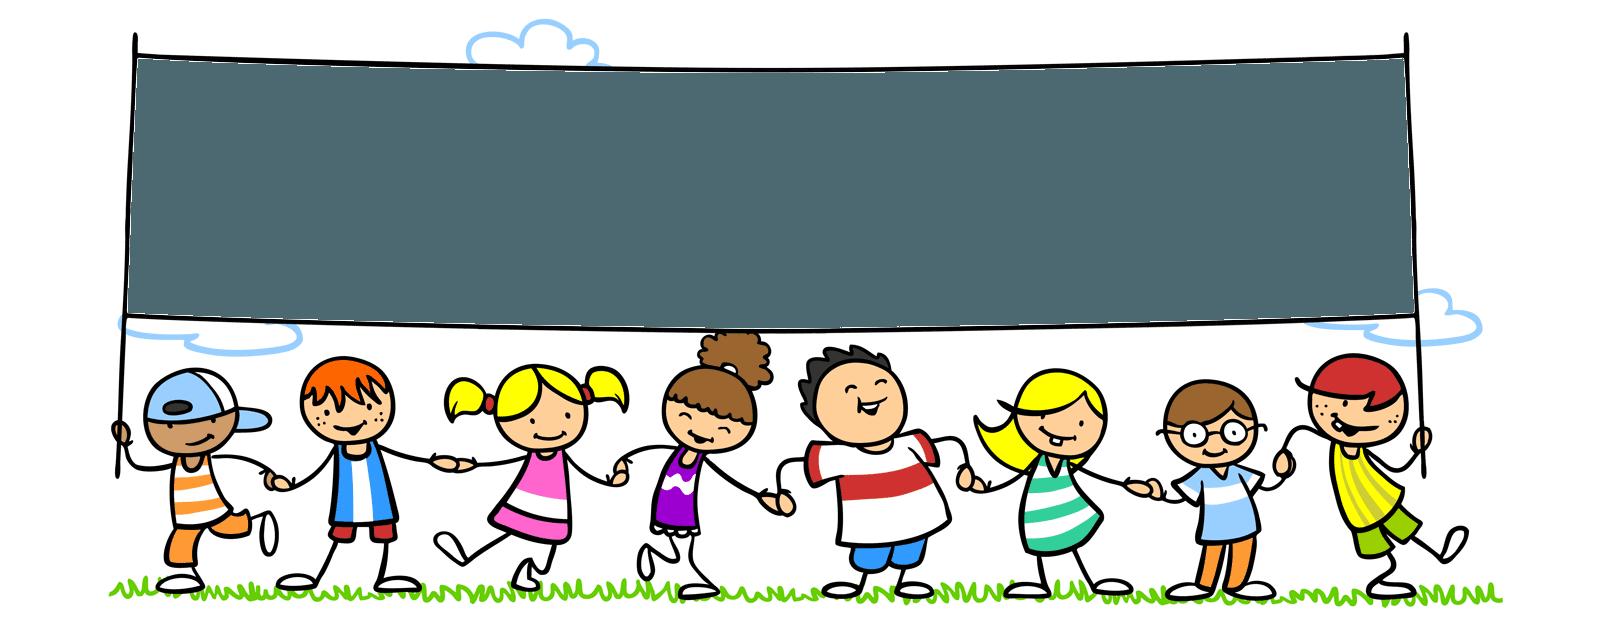 Mckee language schools spanish. Drill clipart preschooler